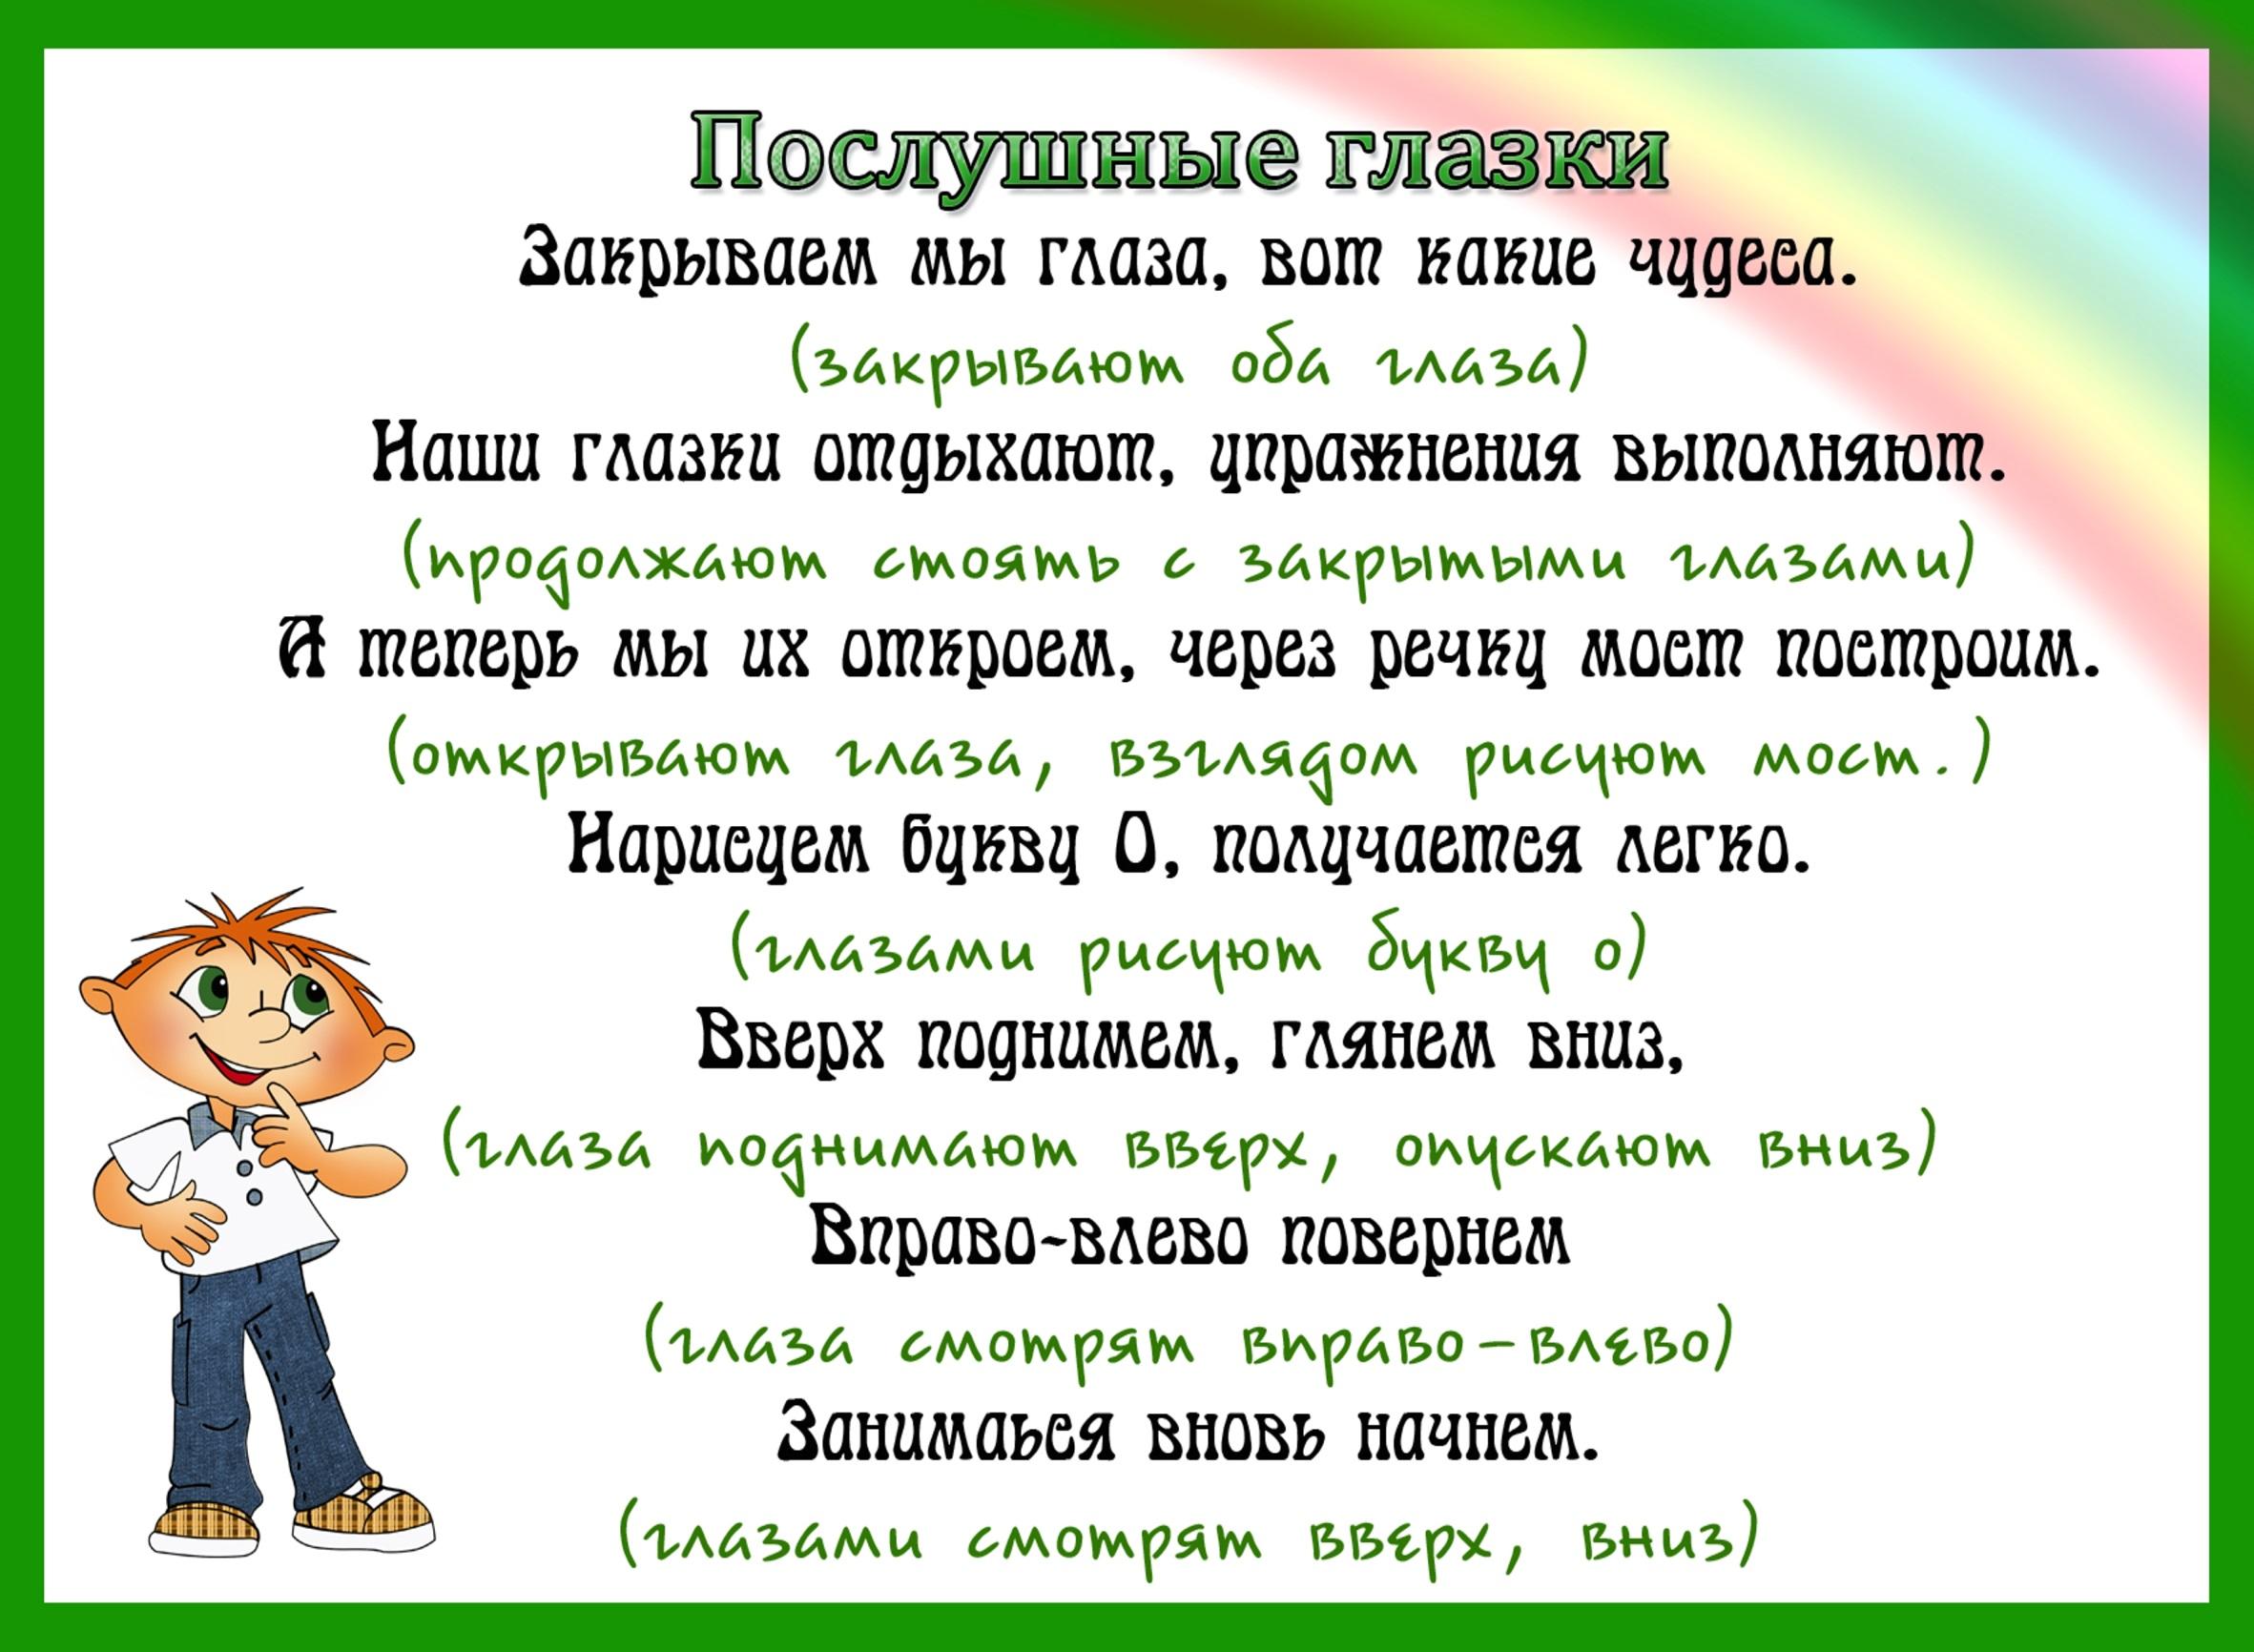 http://protasova.nios.ru/sites/default/files/poslushnye_glazki.jpg